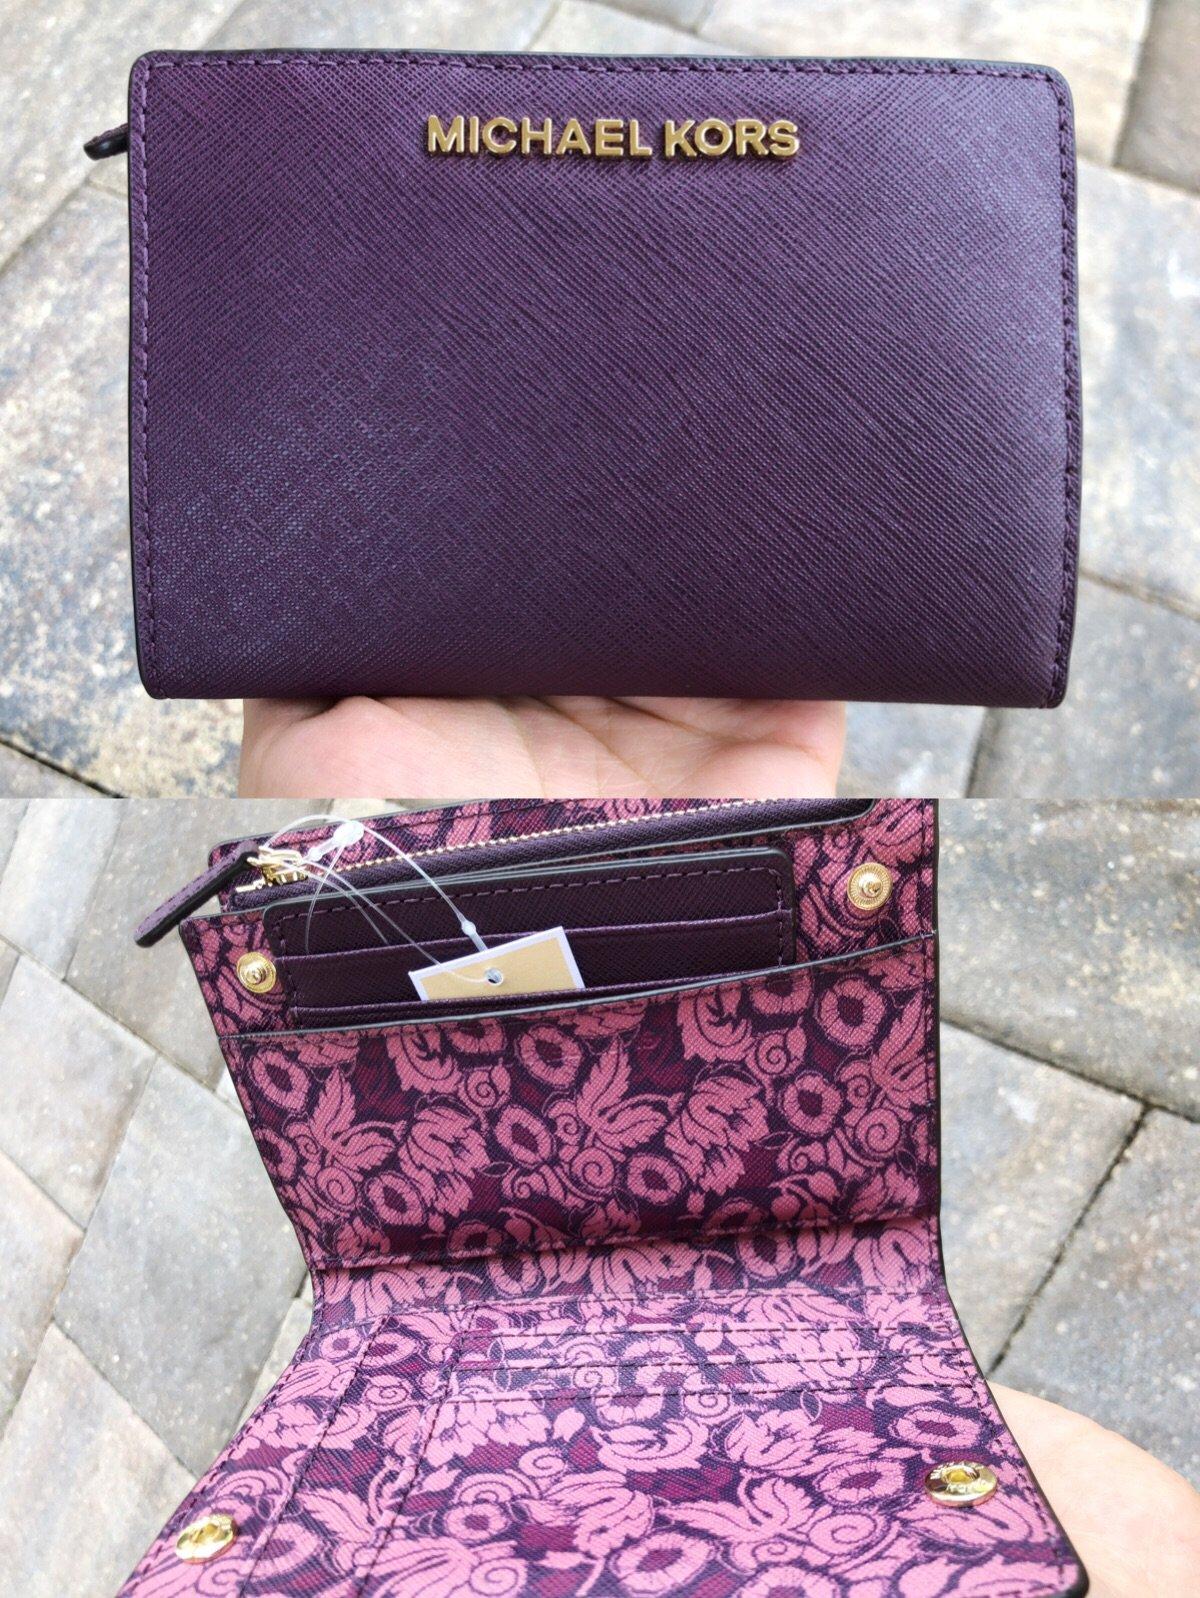 73a5d157a29dc Michael Kors Medium Card Case Carryall Wallet Damson Mulberry Floral ...